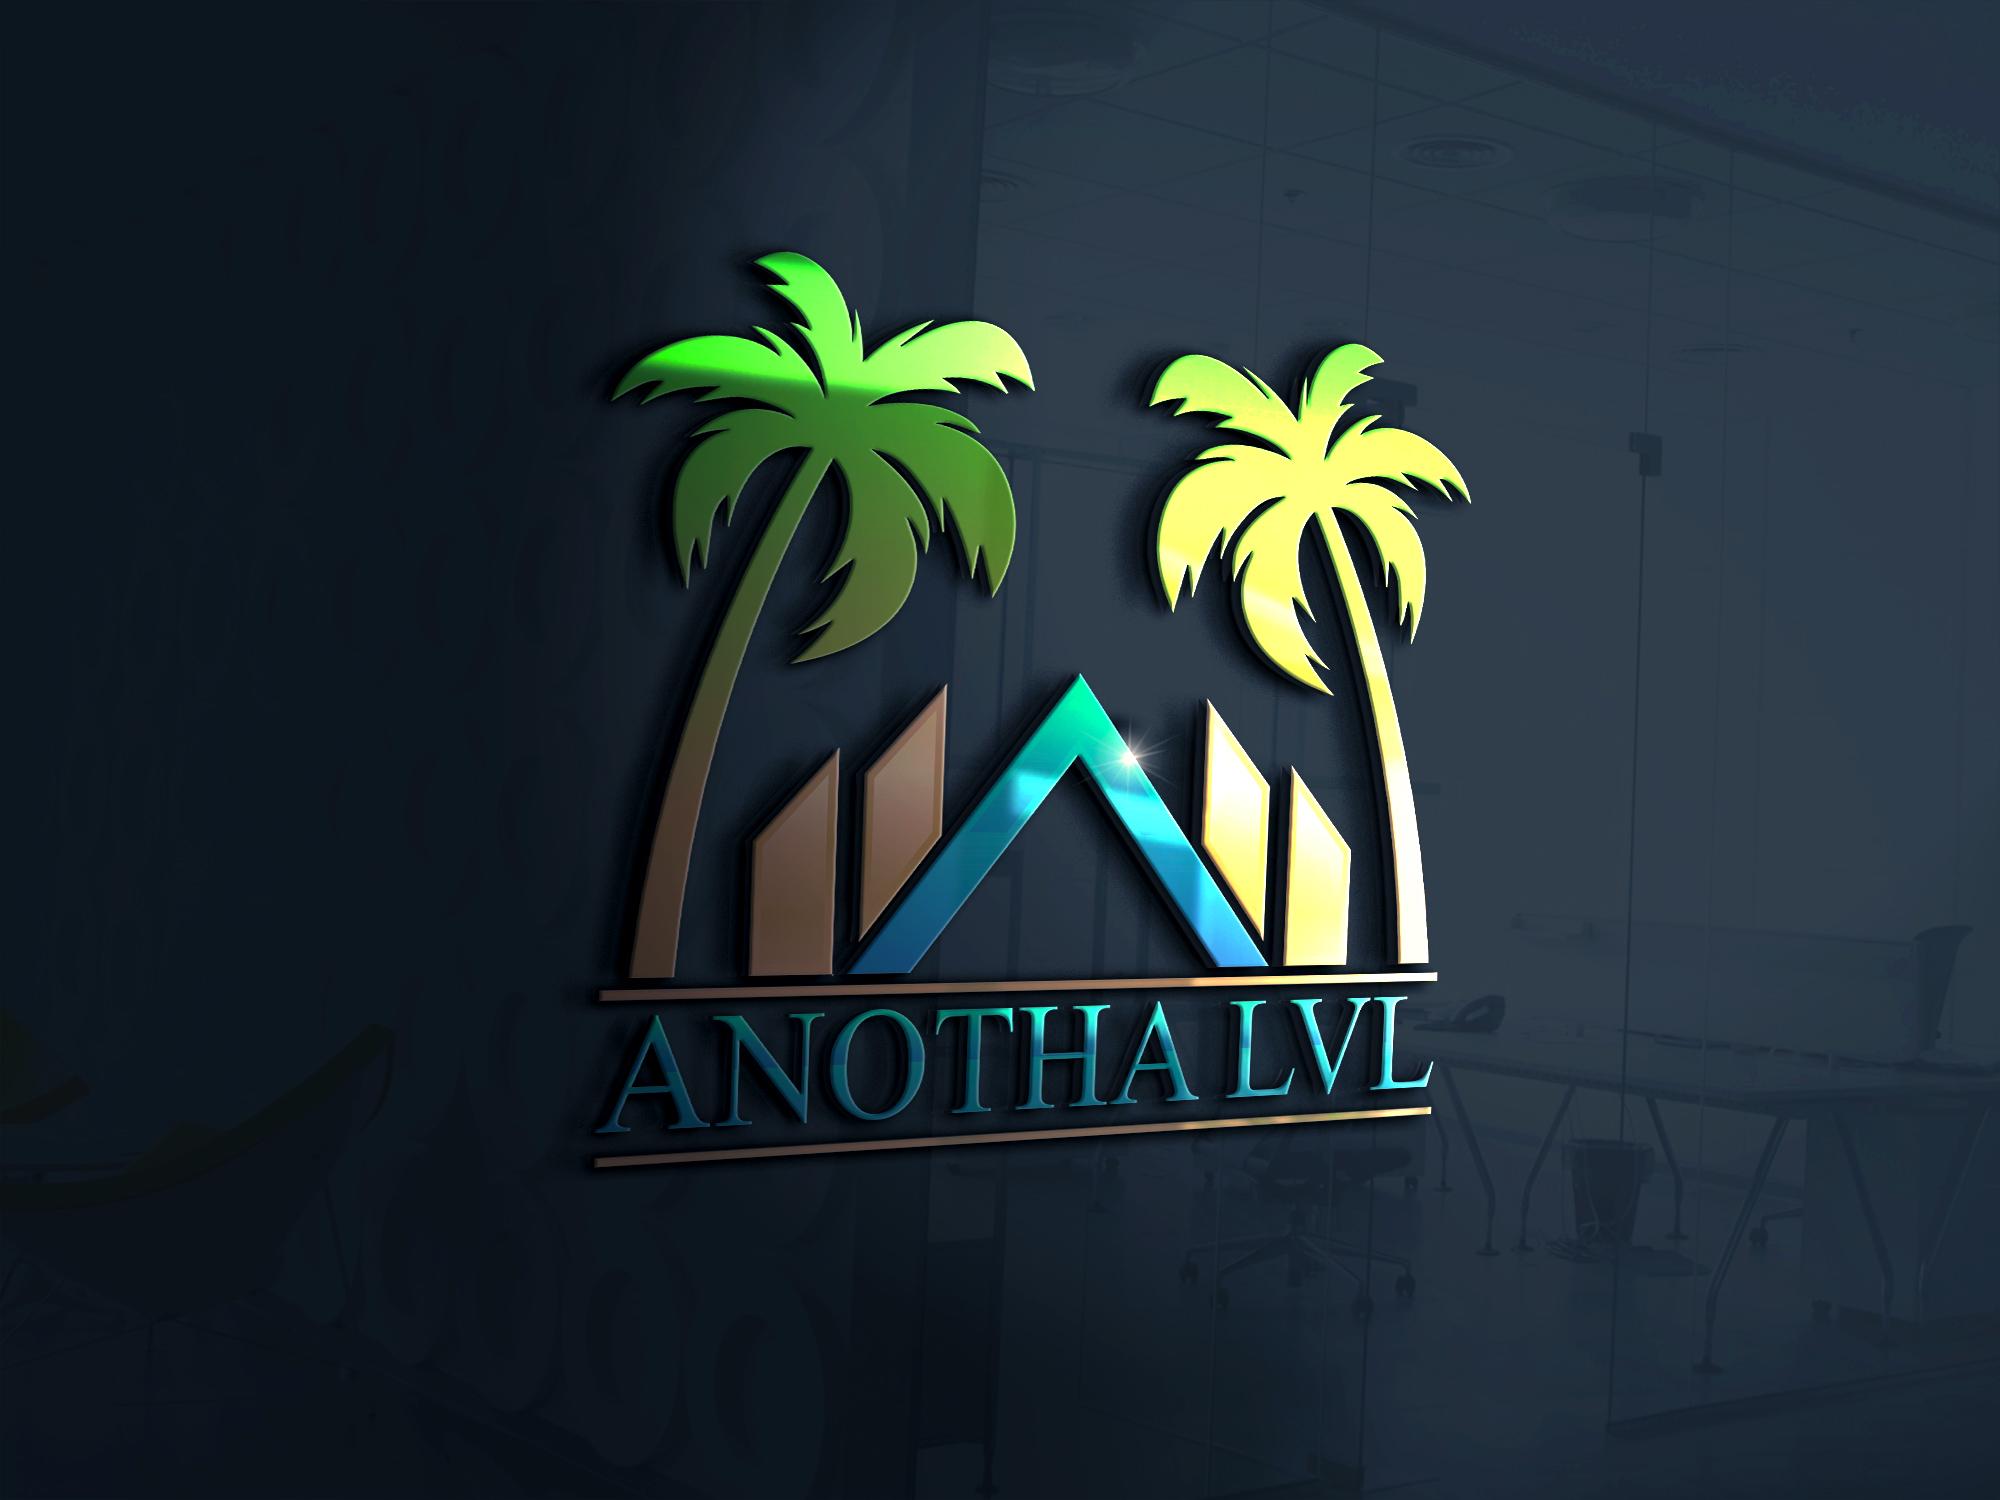 I will design a real estate business logo